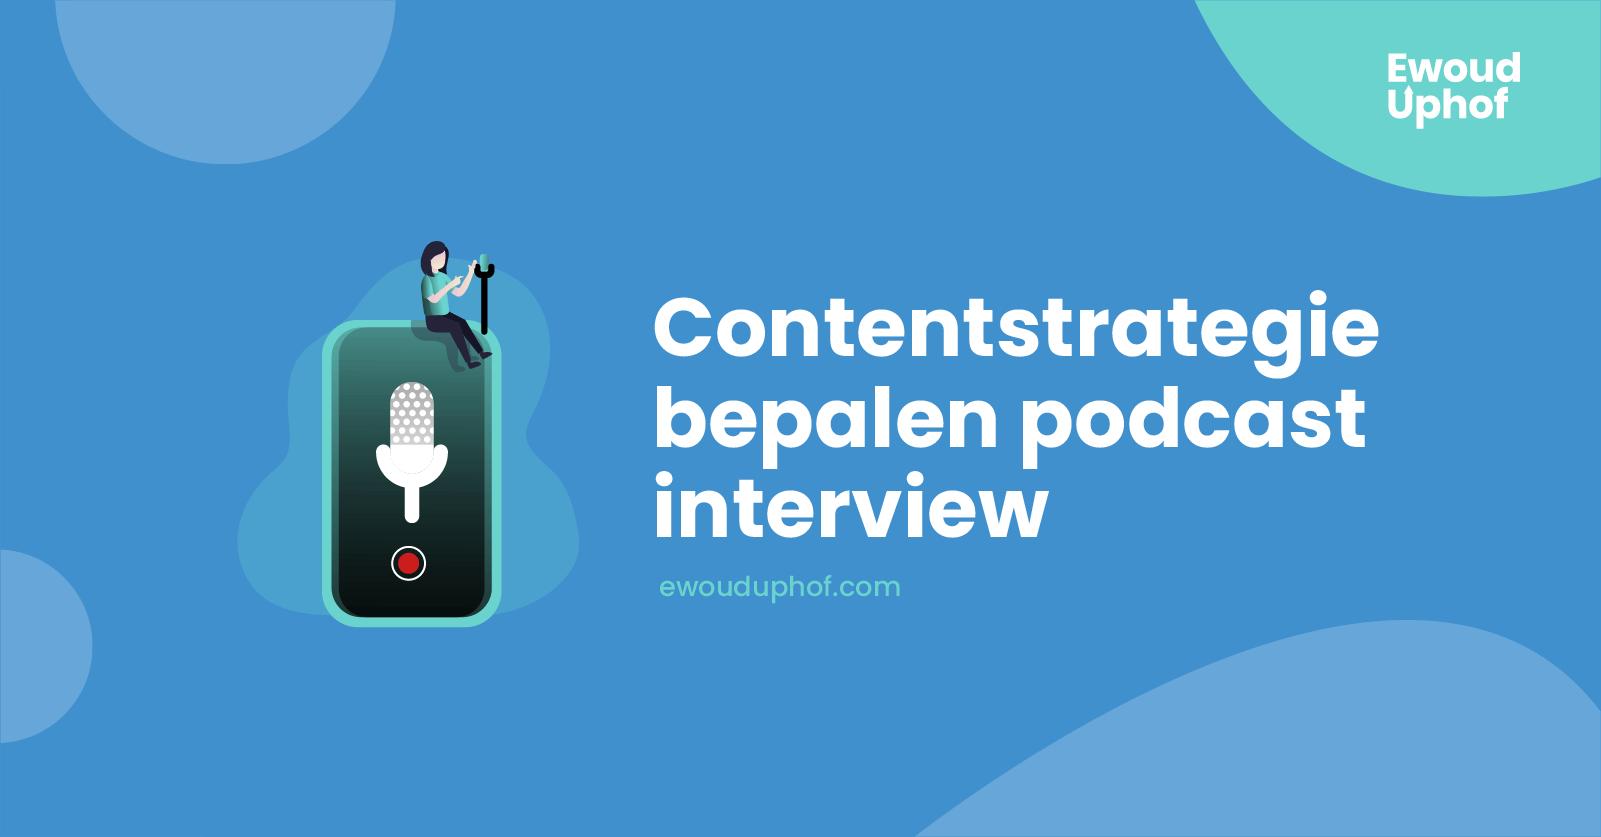 Contentstrategie personal brand